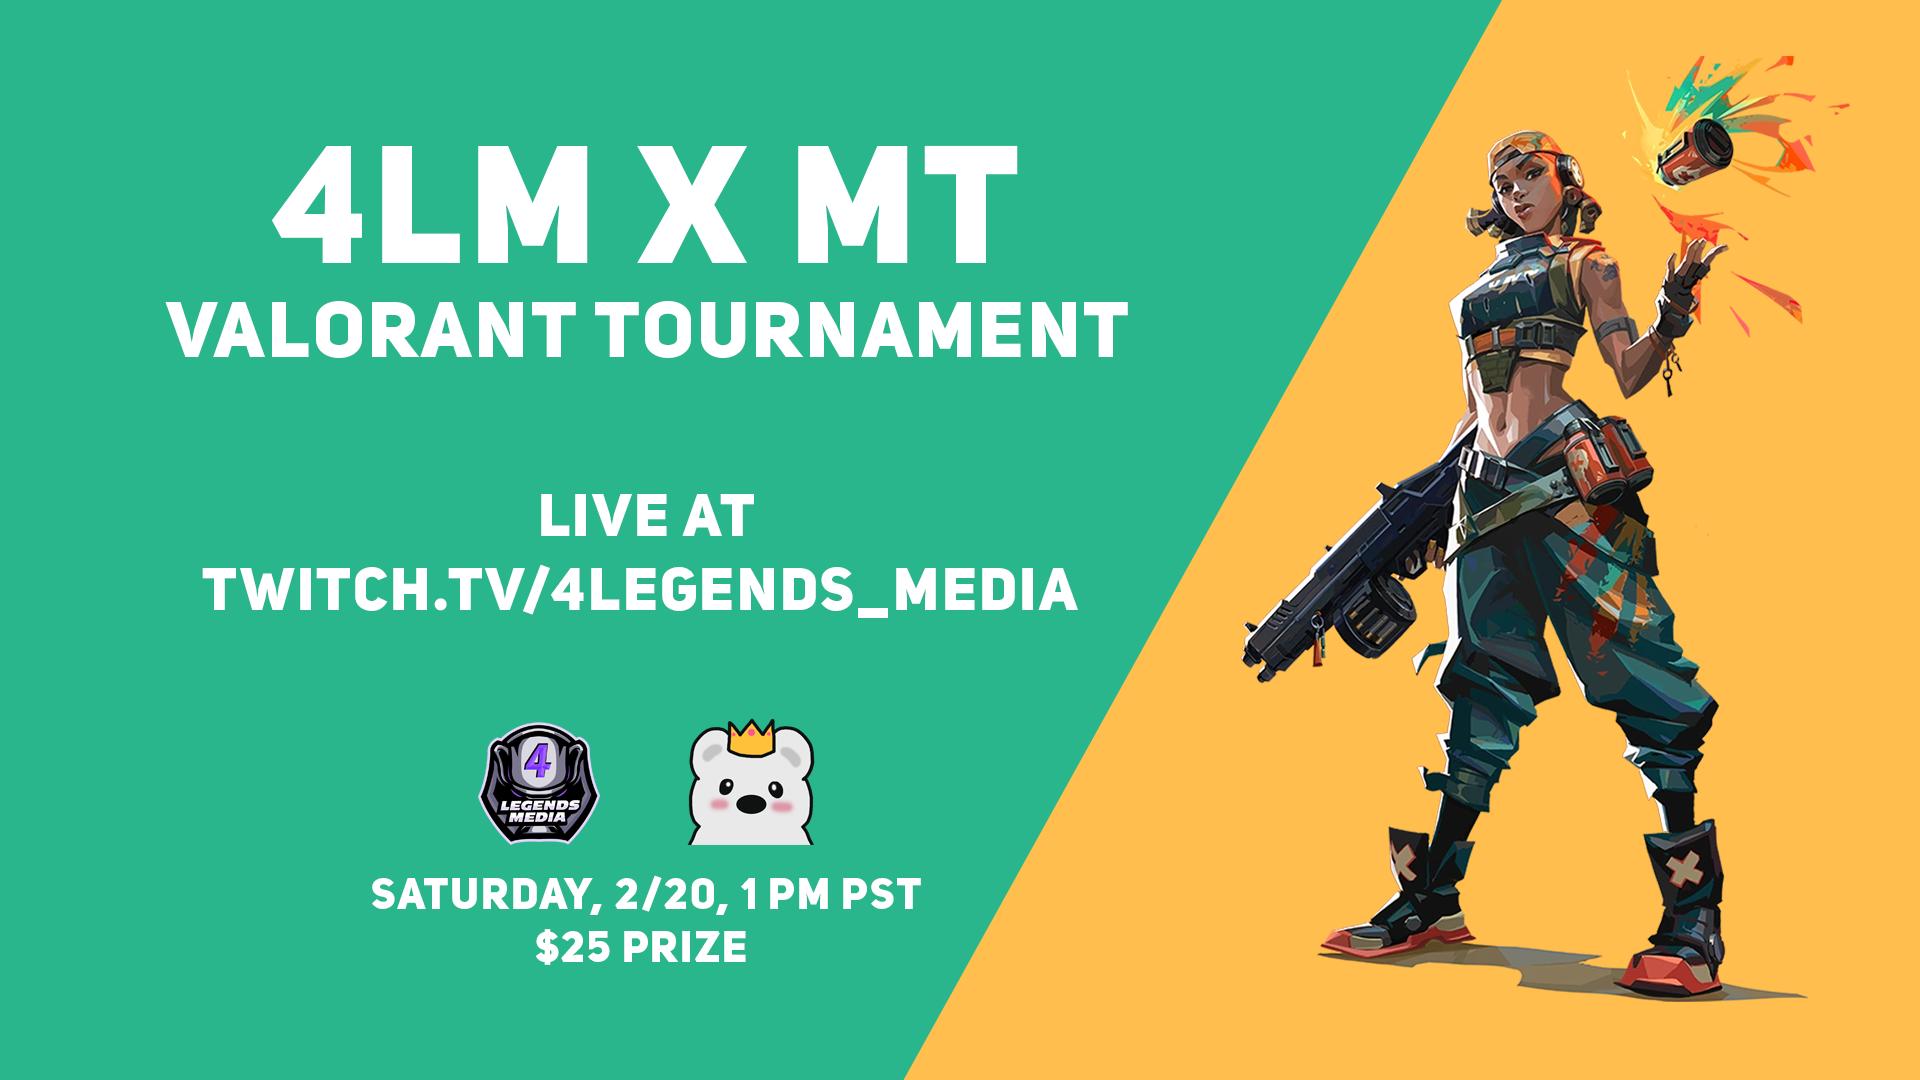 Announcing the 4LM x MT Valorant Tournament